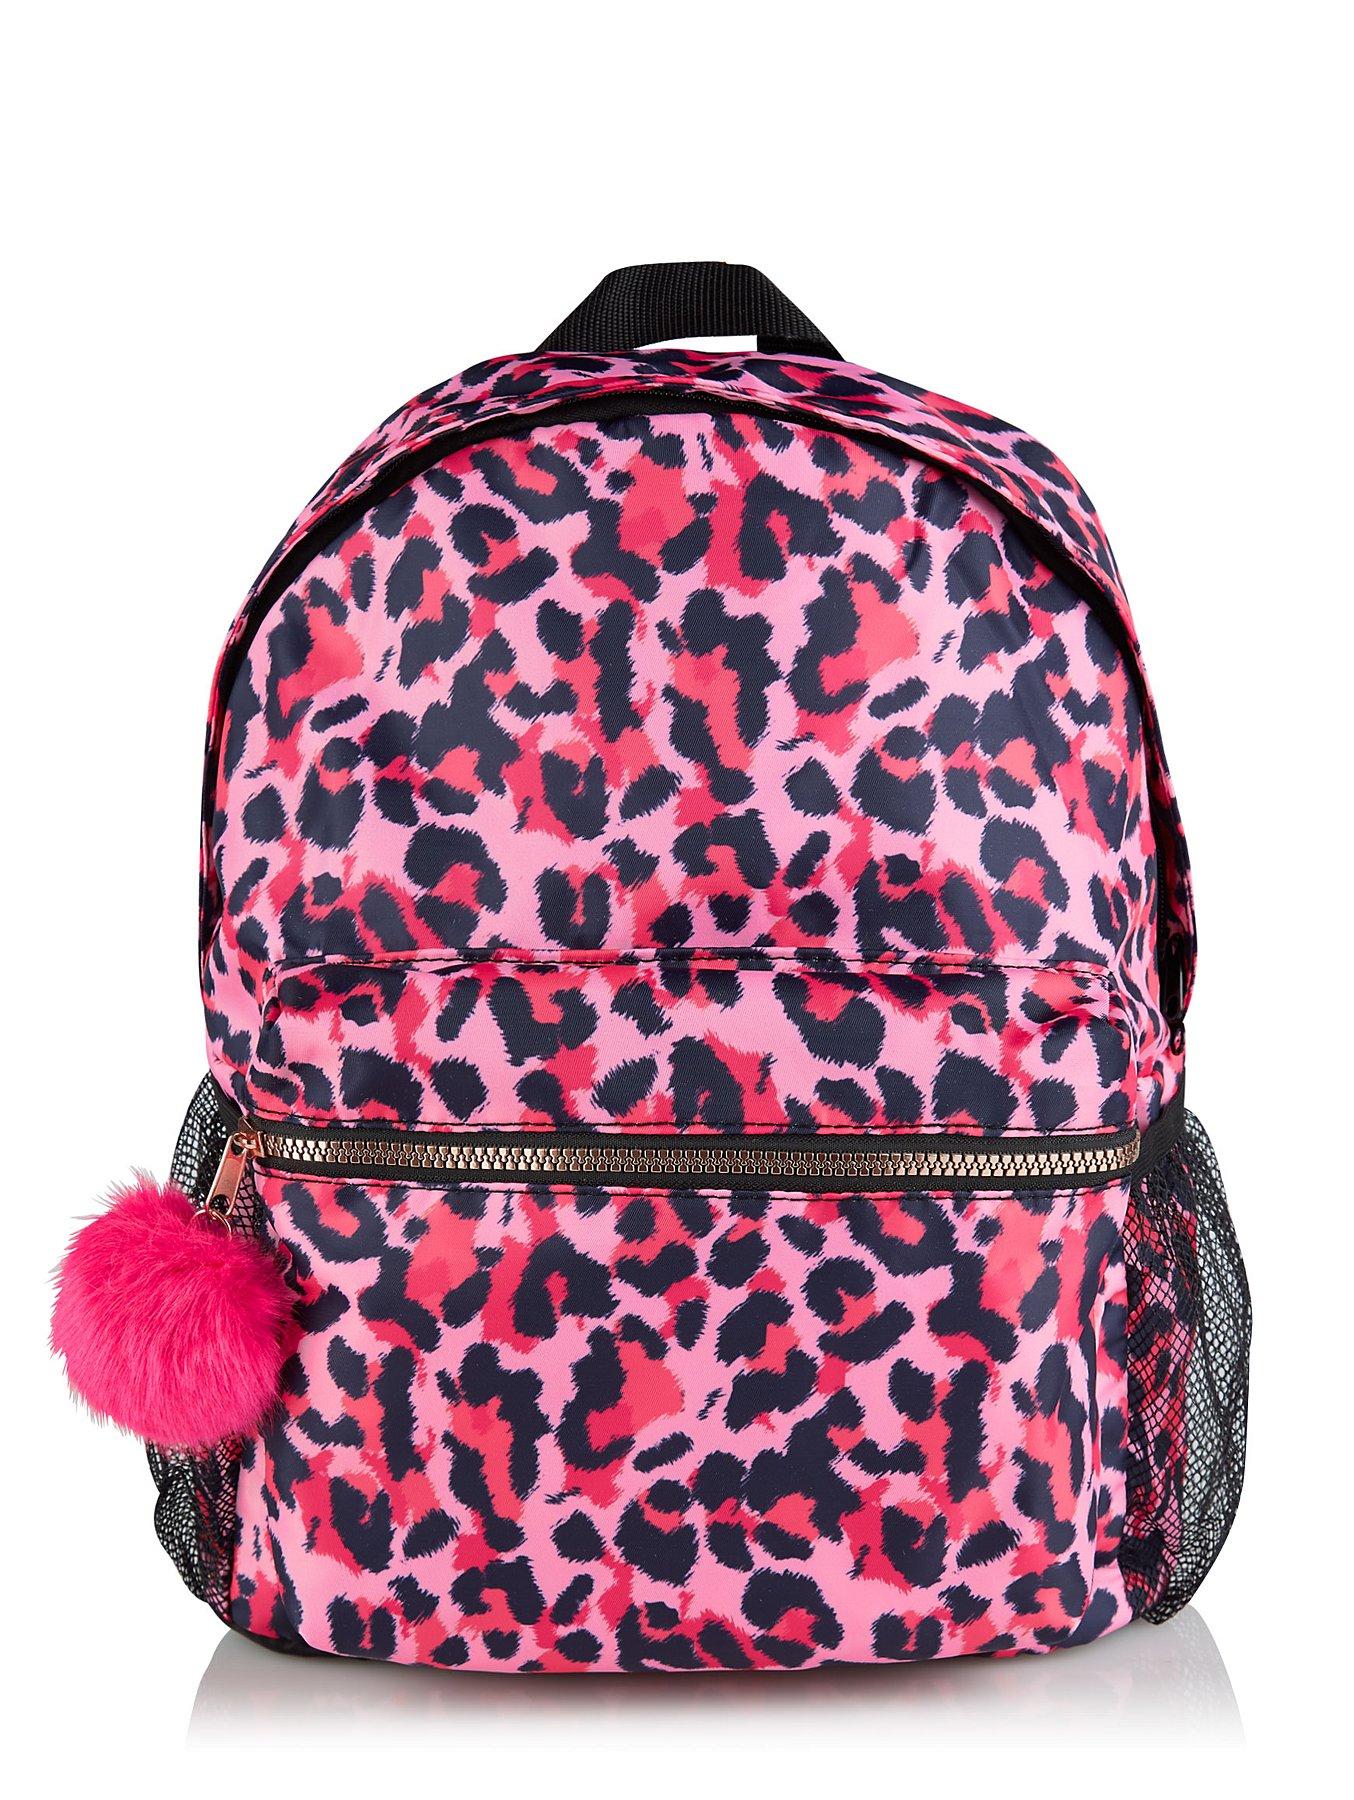 Pink Leopard Print Rucksack